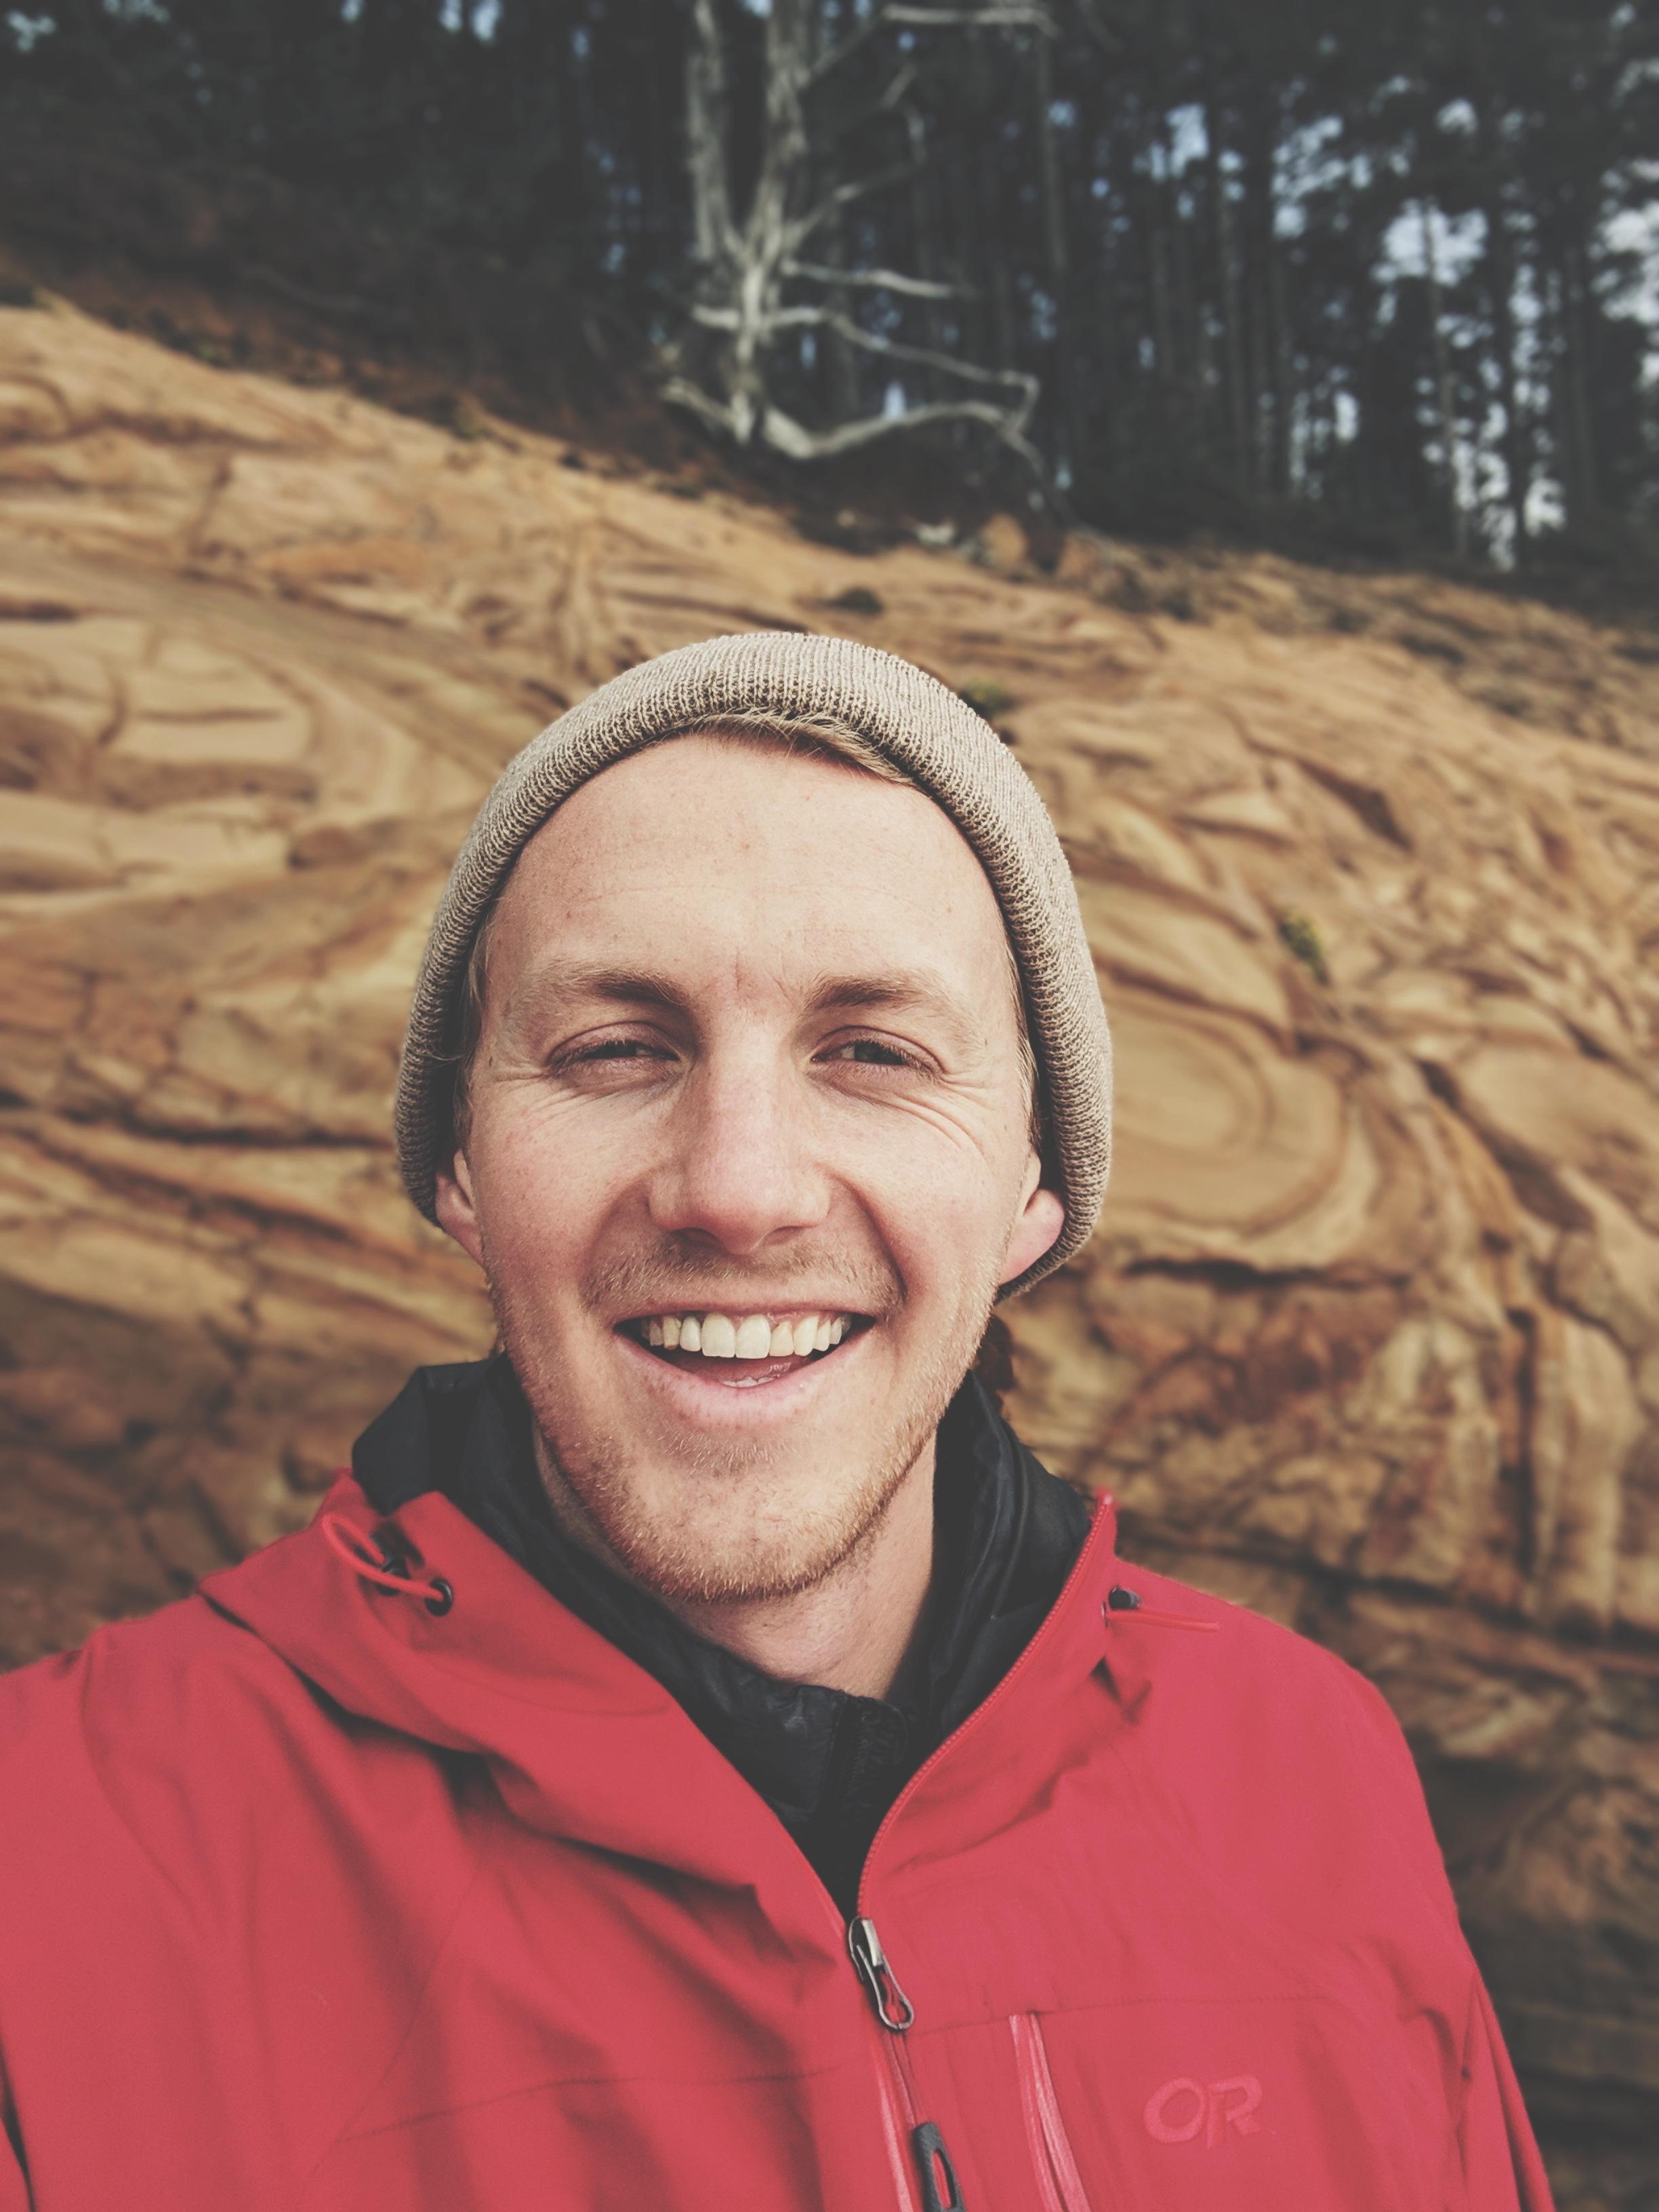 Nate hemann-travel nurse van life-Southern Oregon Coast-cape sebastian